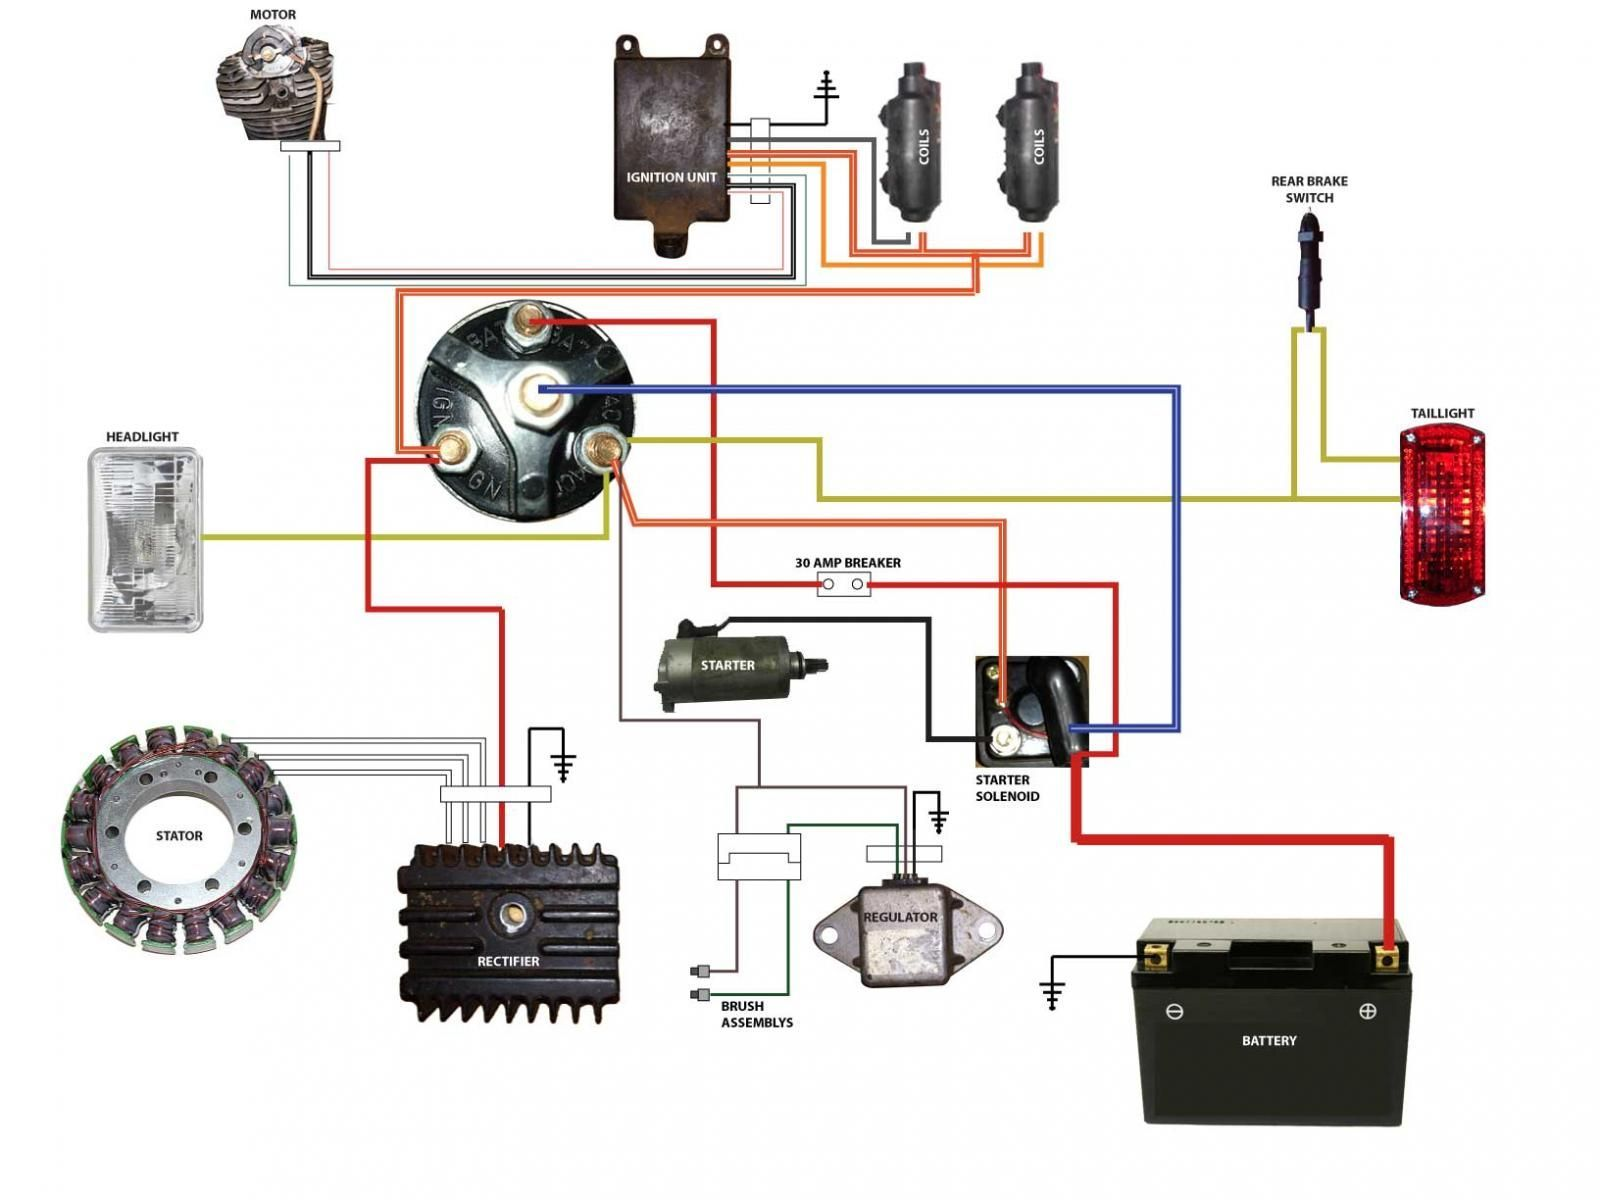 E 85 Bmw Z4 Wiring Diagram In 2021 Motorcycle Wiring Bobber Motorcycle Bobber